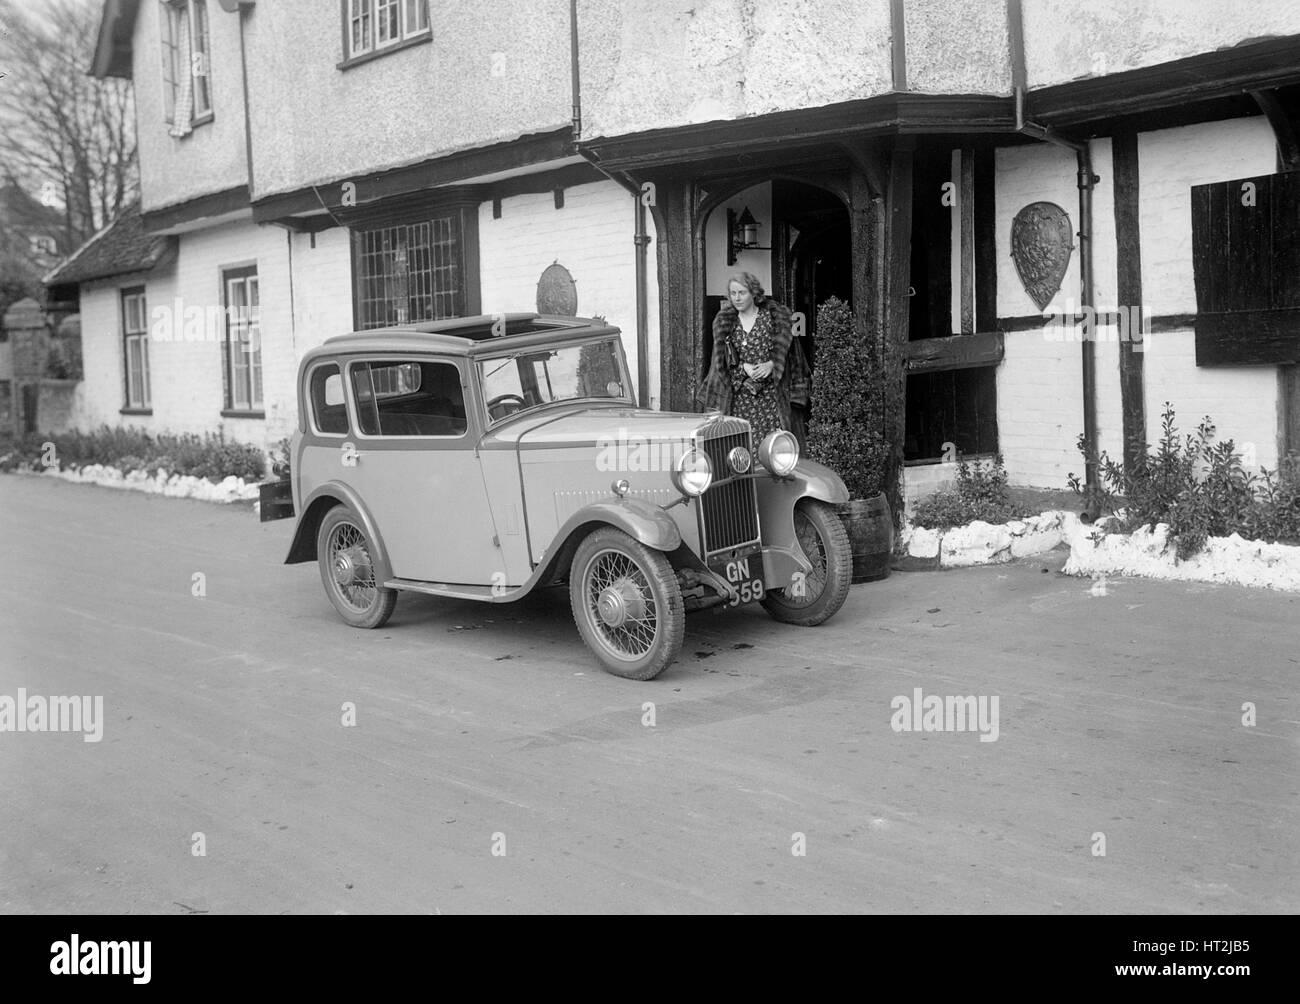 Road testing a Triumph Scorpion, 1931. Artist: Bill Brunell. - Stock Image